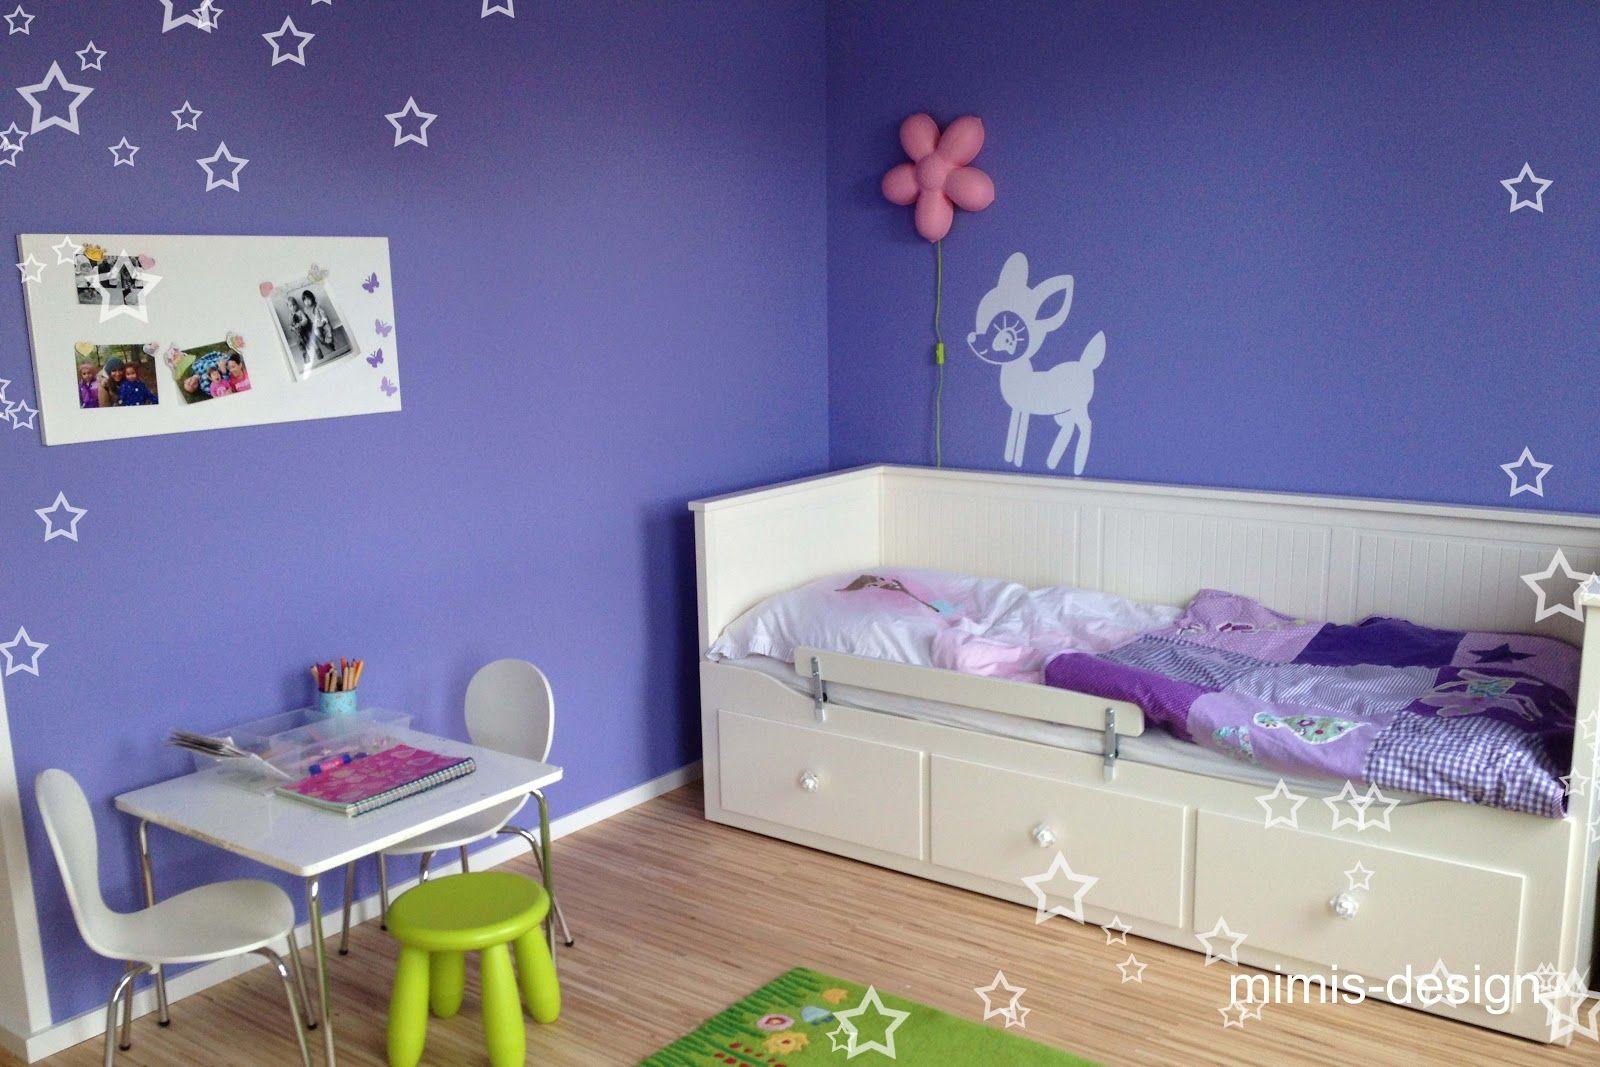 Ikea kinderzimmermöbel ~ Mimis design kinderzimmer mädchenzimmer ikea hack hemnes